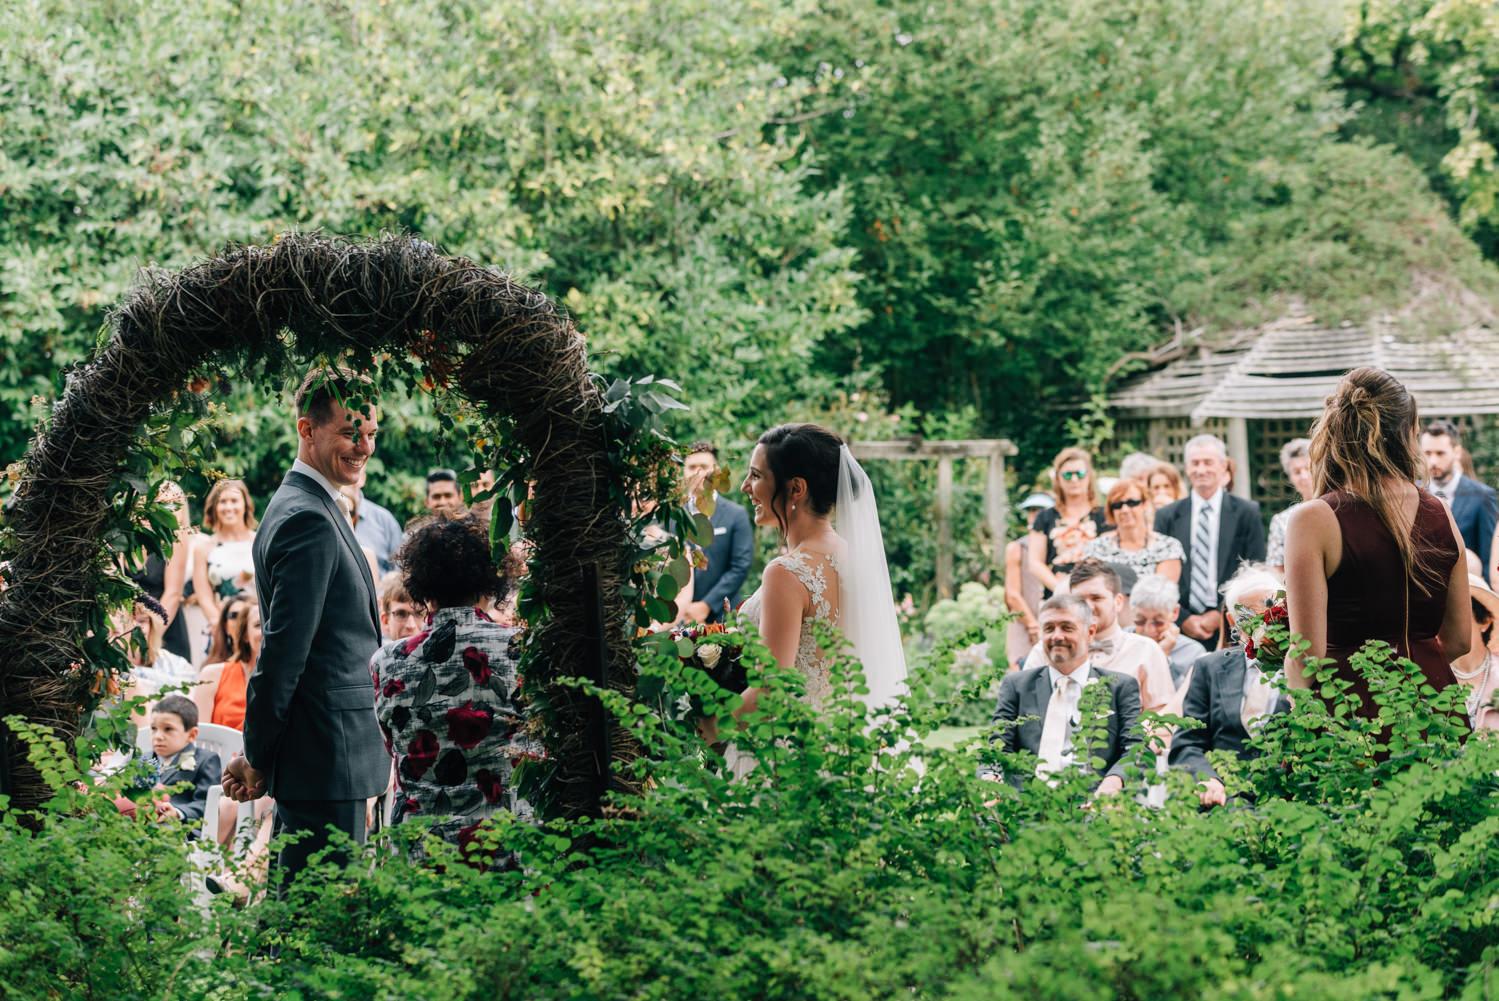 Brickendon-Wedding-Photographer-45.jpg